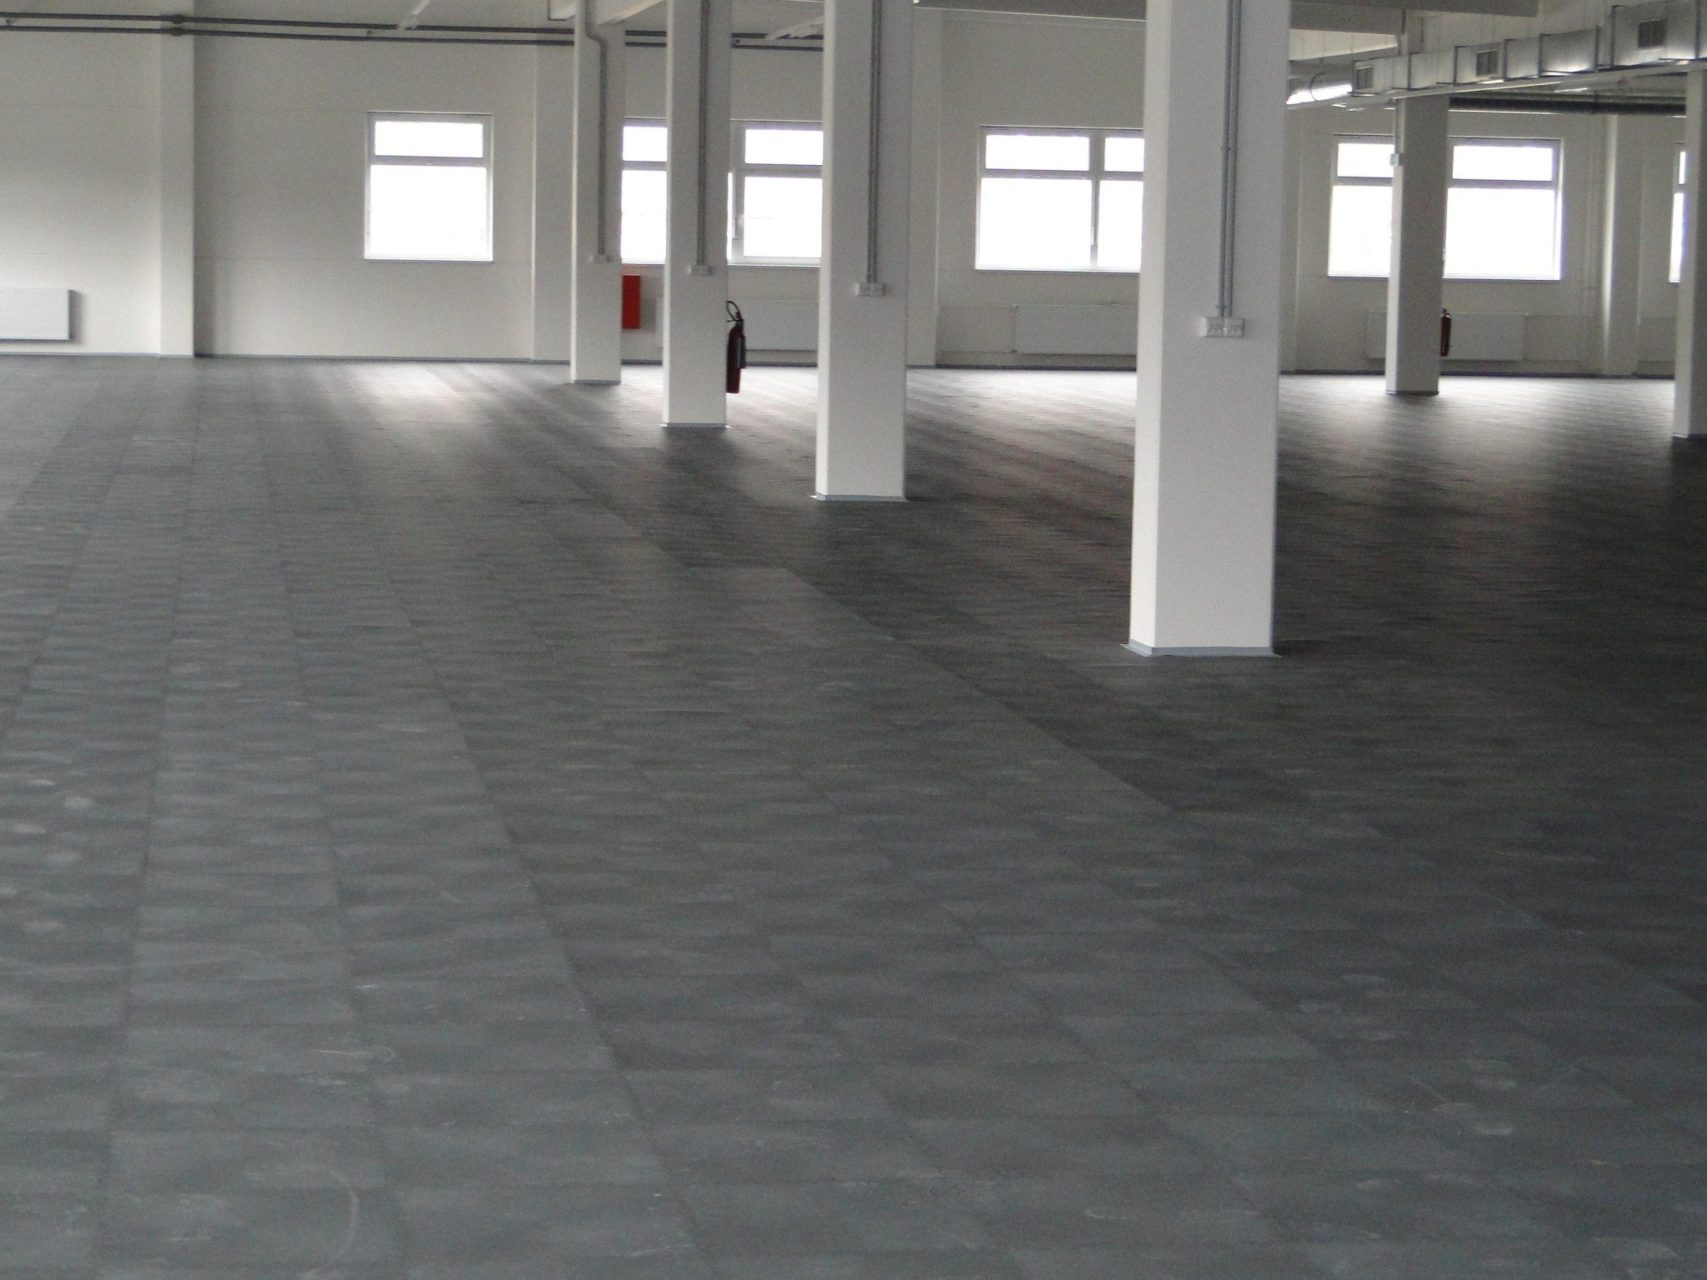 industrieboden-gewerbeboden-werkstatt-jp-mechanic-pvc-fliese-platte-großlager-lager-industriehalle-produktion-fertigung-1